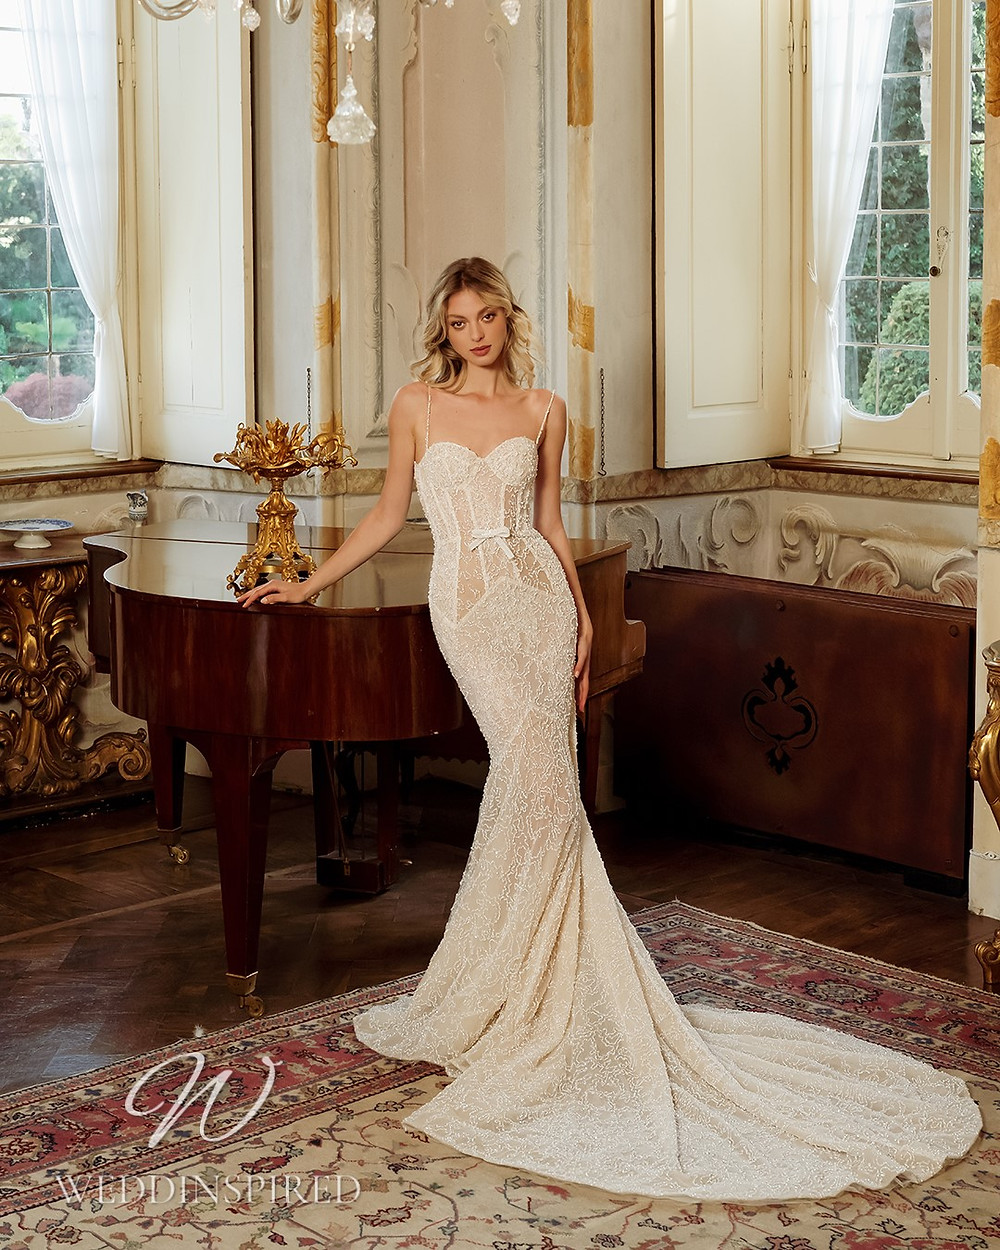 A Berta 2022 lace mermaid wedding dress